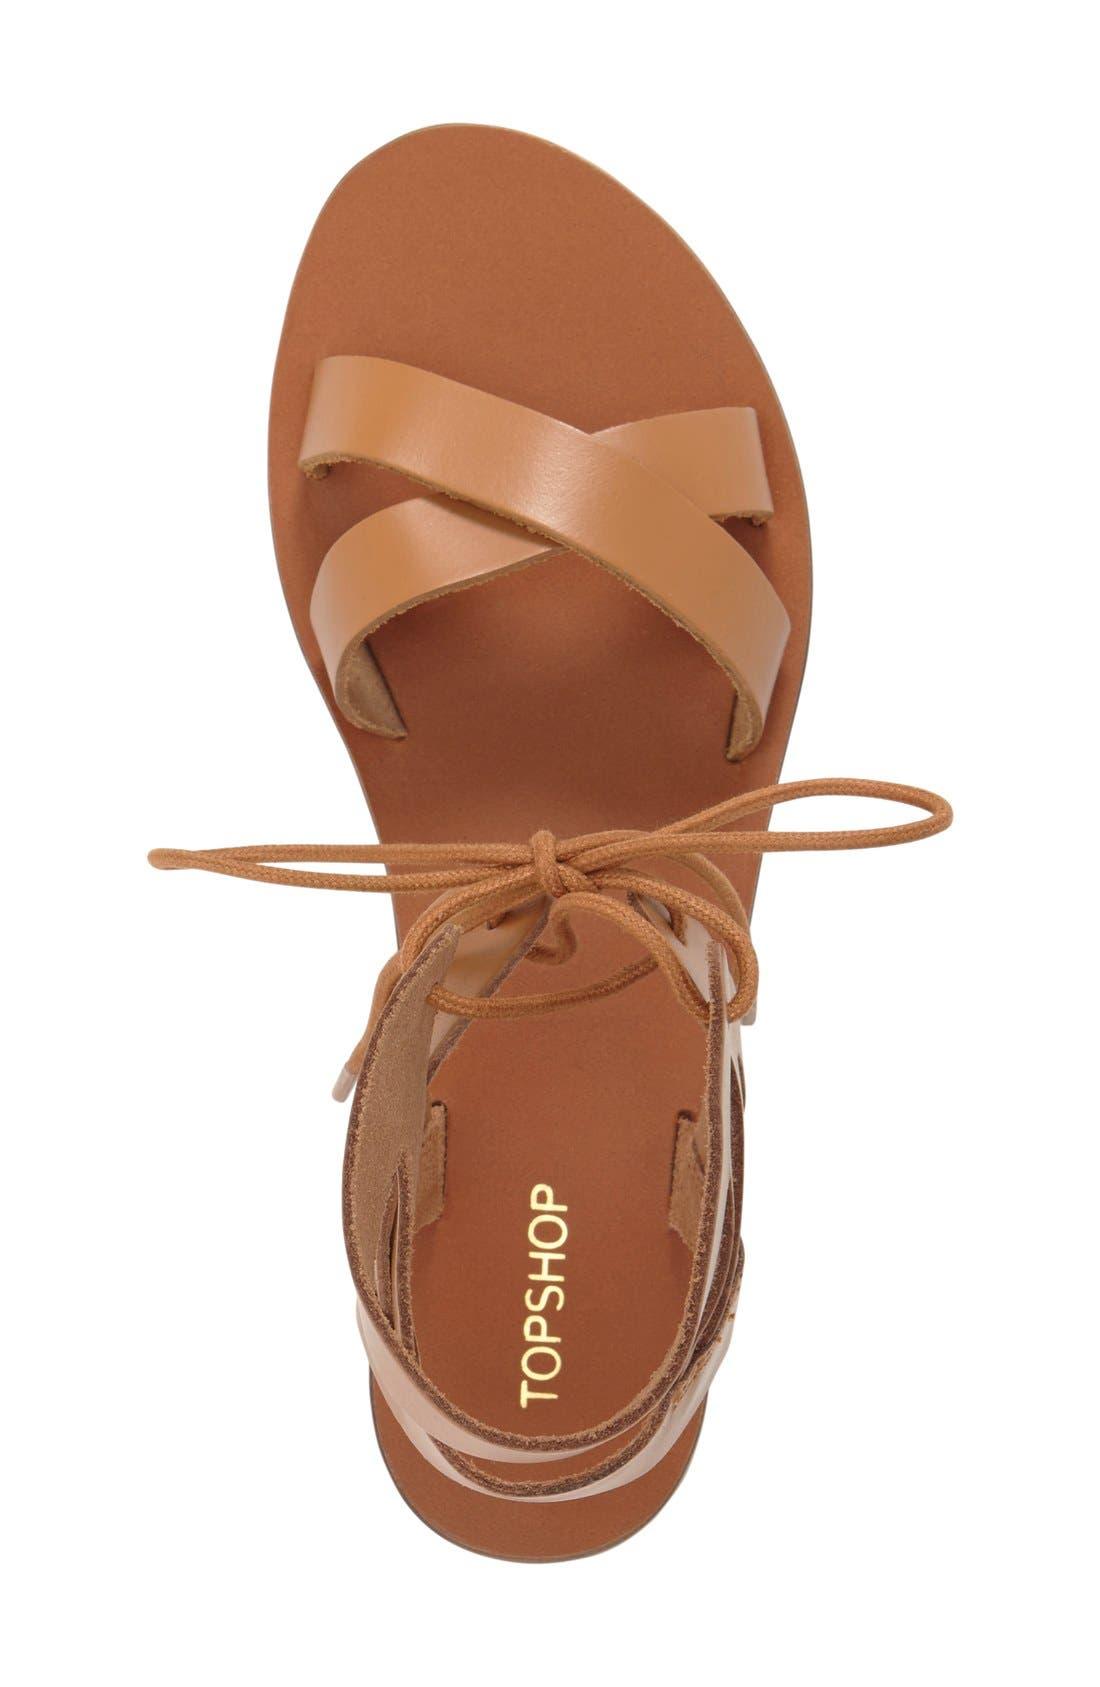 TOPSHOP, 'Herb' Lace-Up Flat Sandal, Alternate thumbnail 4, color, 210